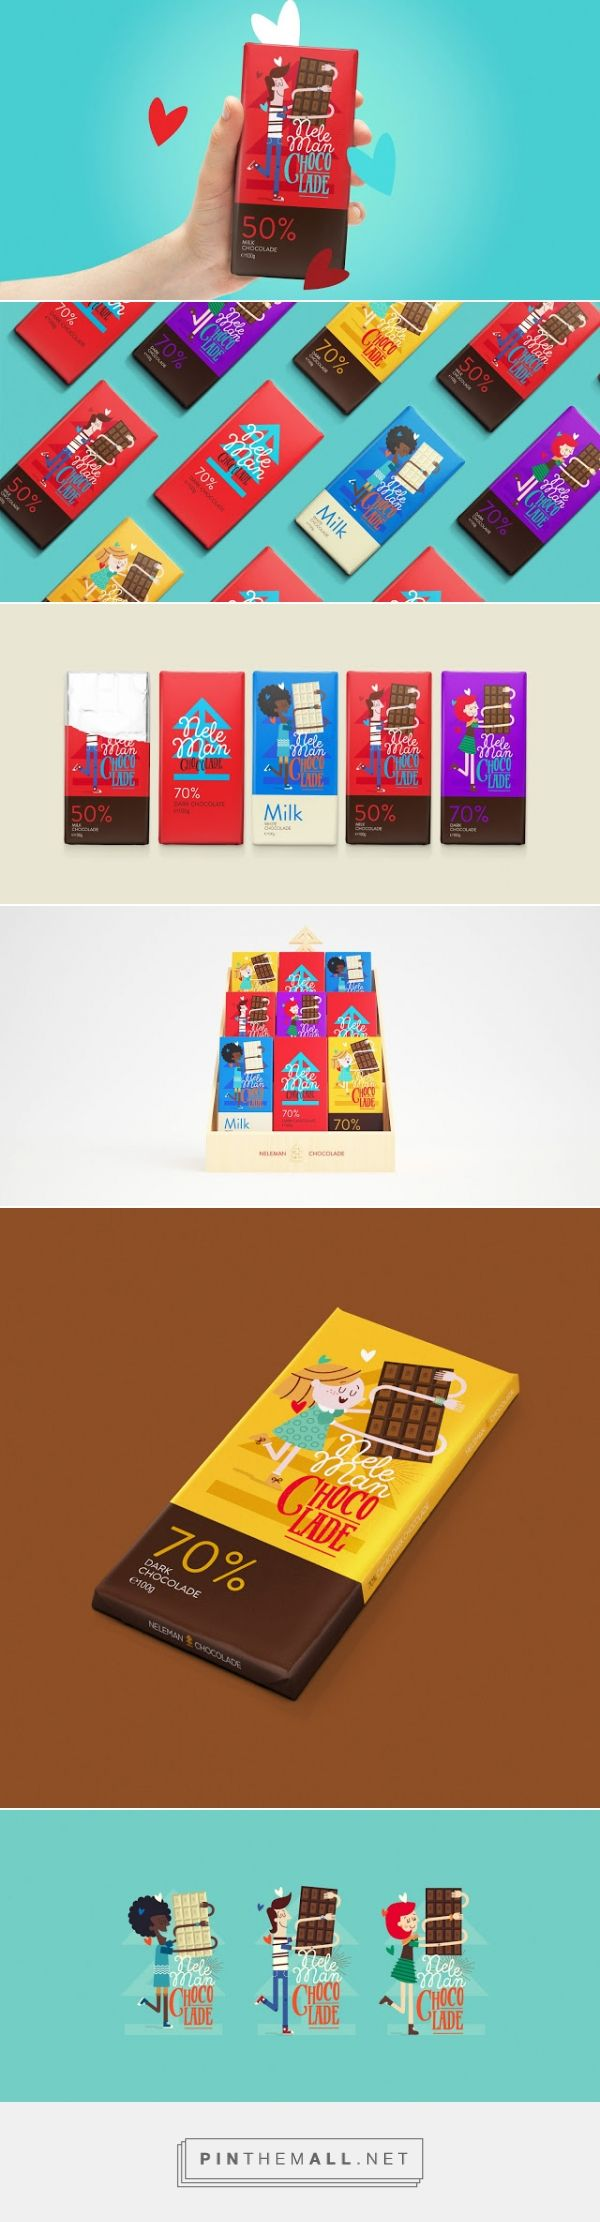 Neleman's Chocolade Chocolate Packaging designed by Sweety & Co. - http://www.packagingoftheworld.com/2015/12/nelemans-chocolade.html